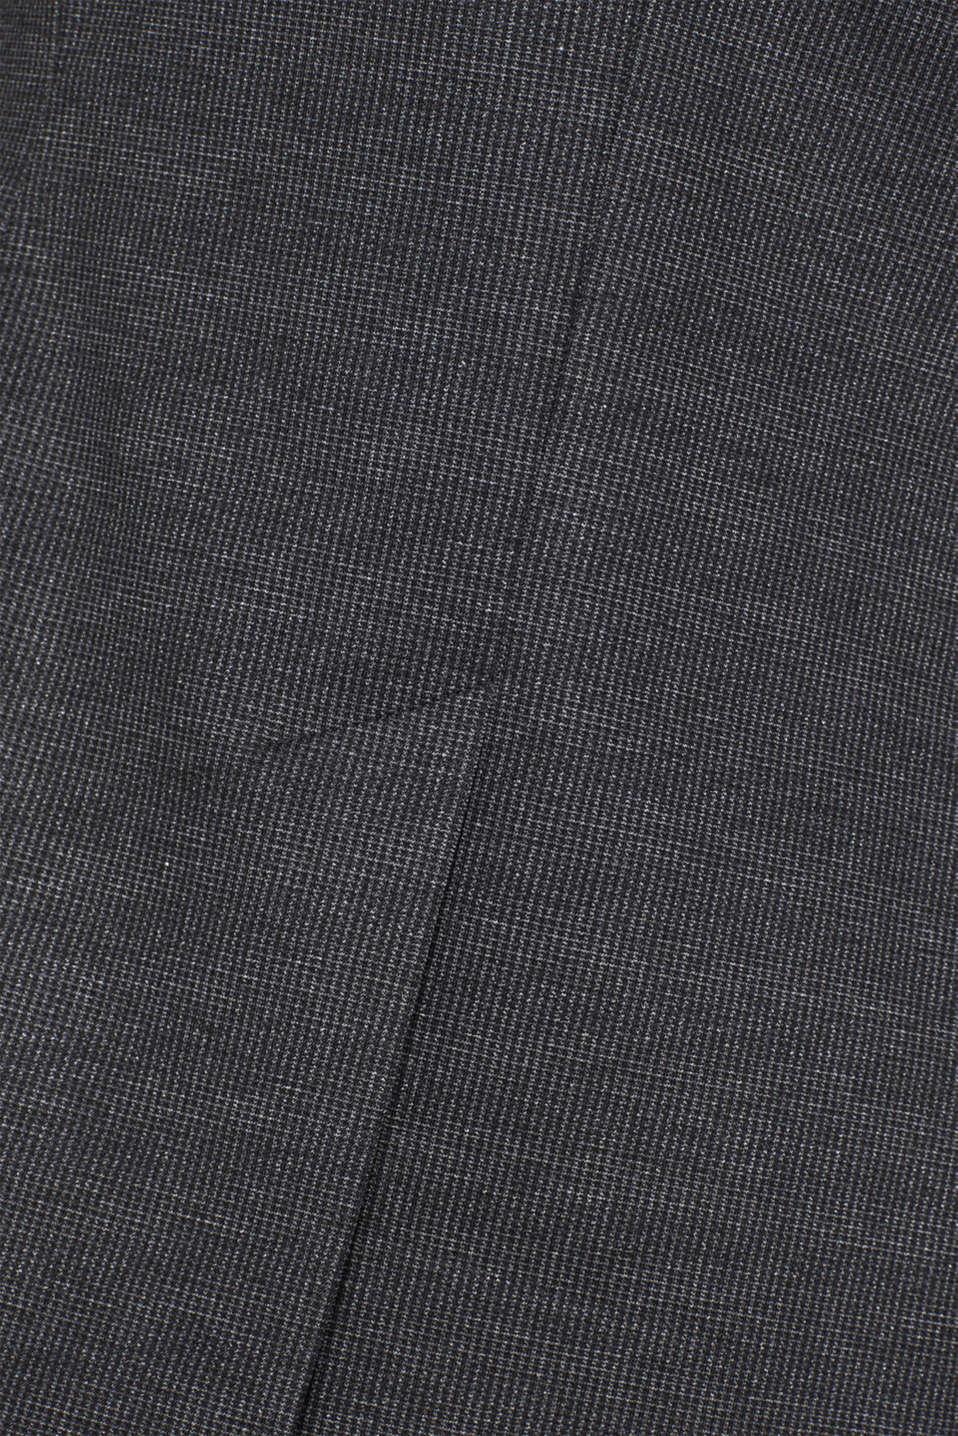 MINI CHECK mix + match stretch blazer, ANTHRACITE, detail image number 4